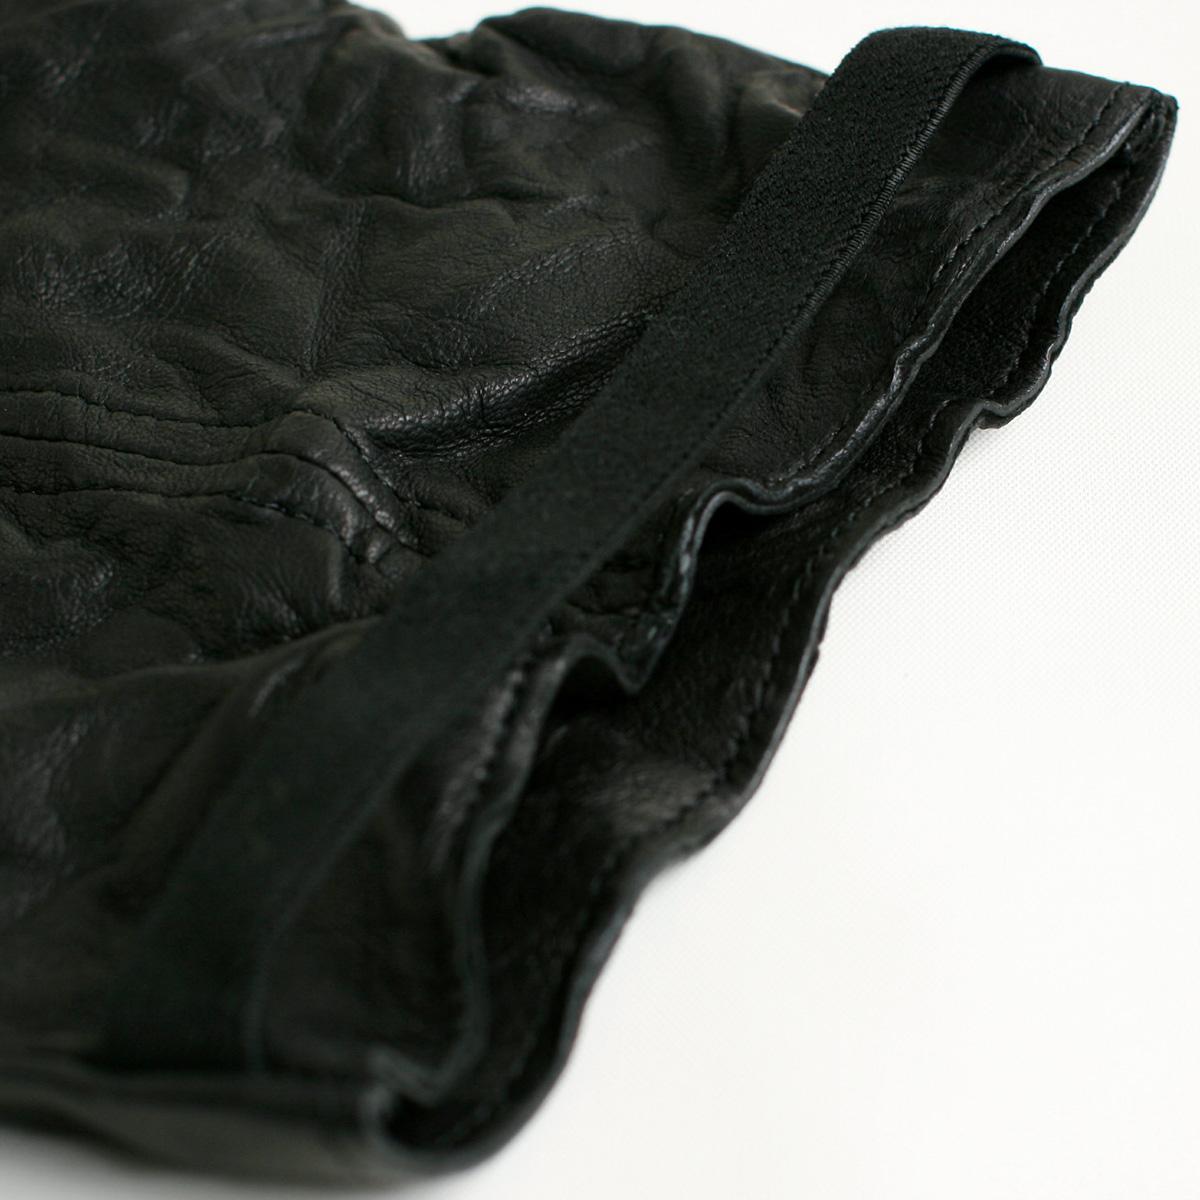 SACCA sizeS black画像